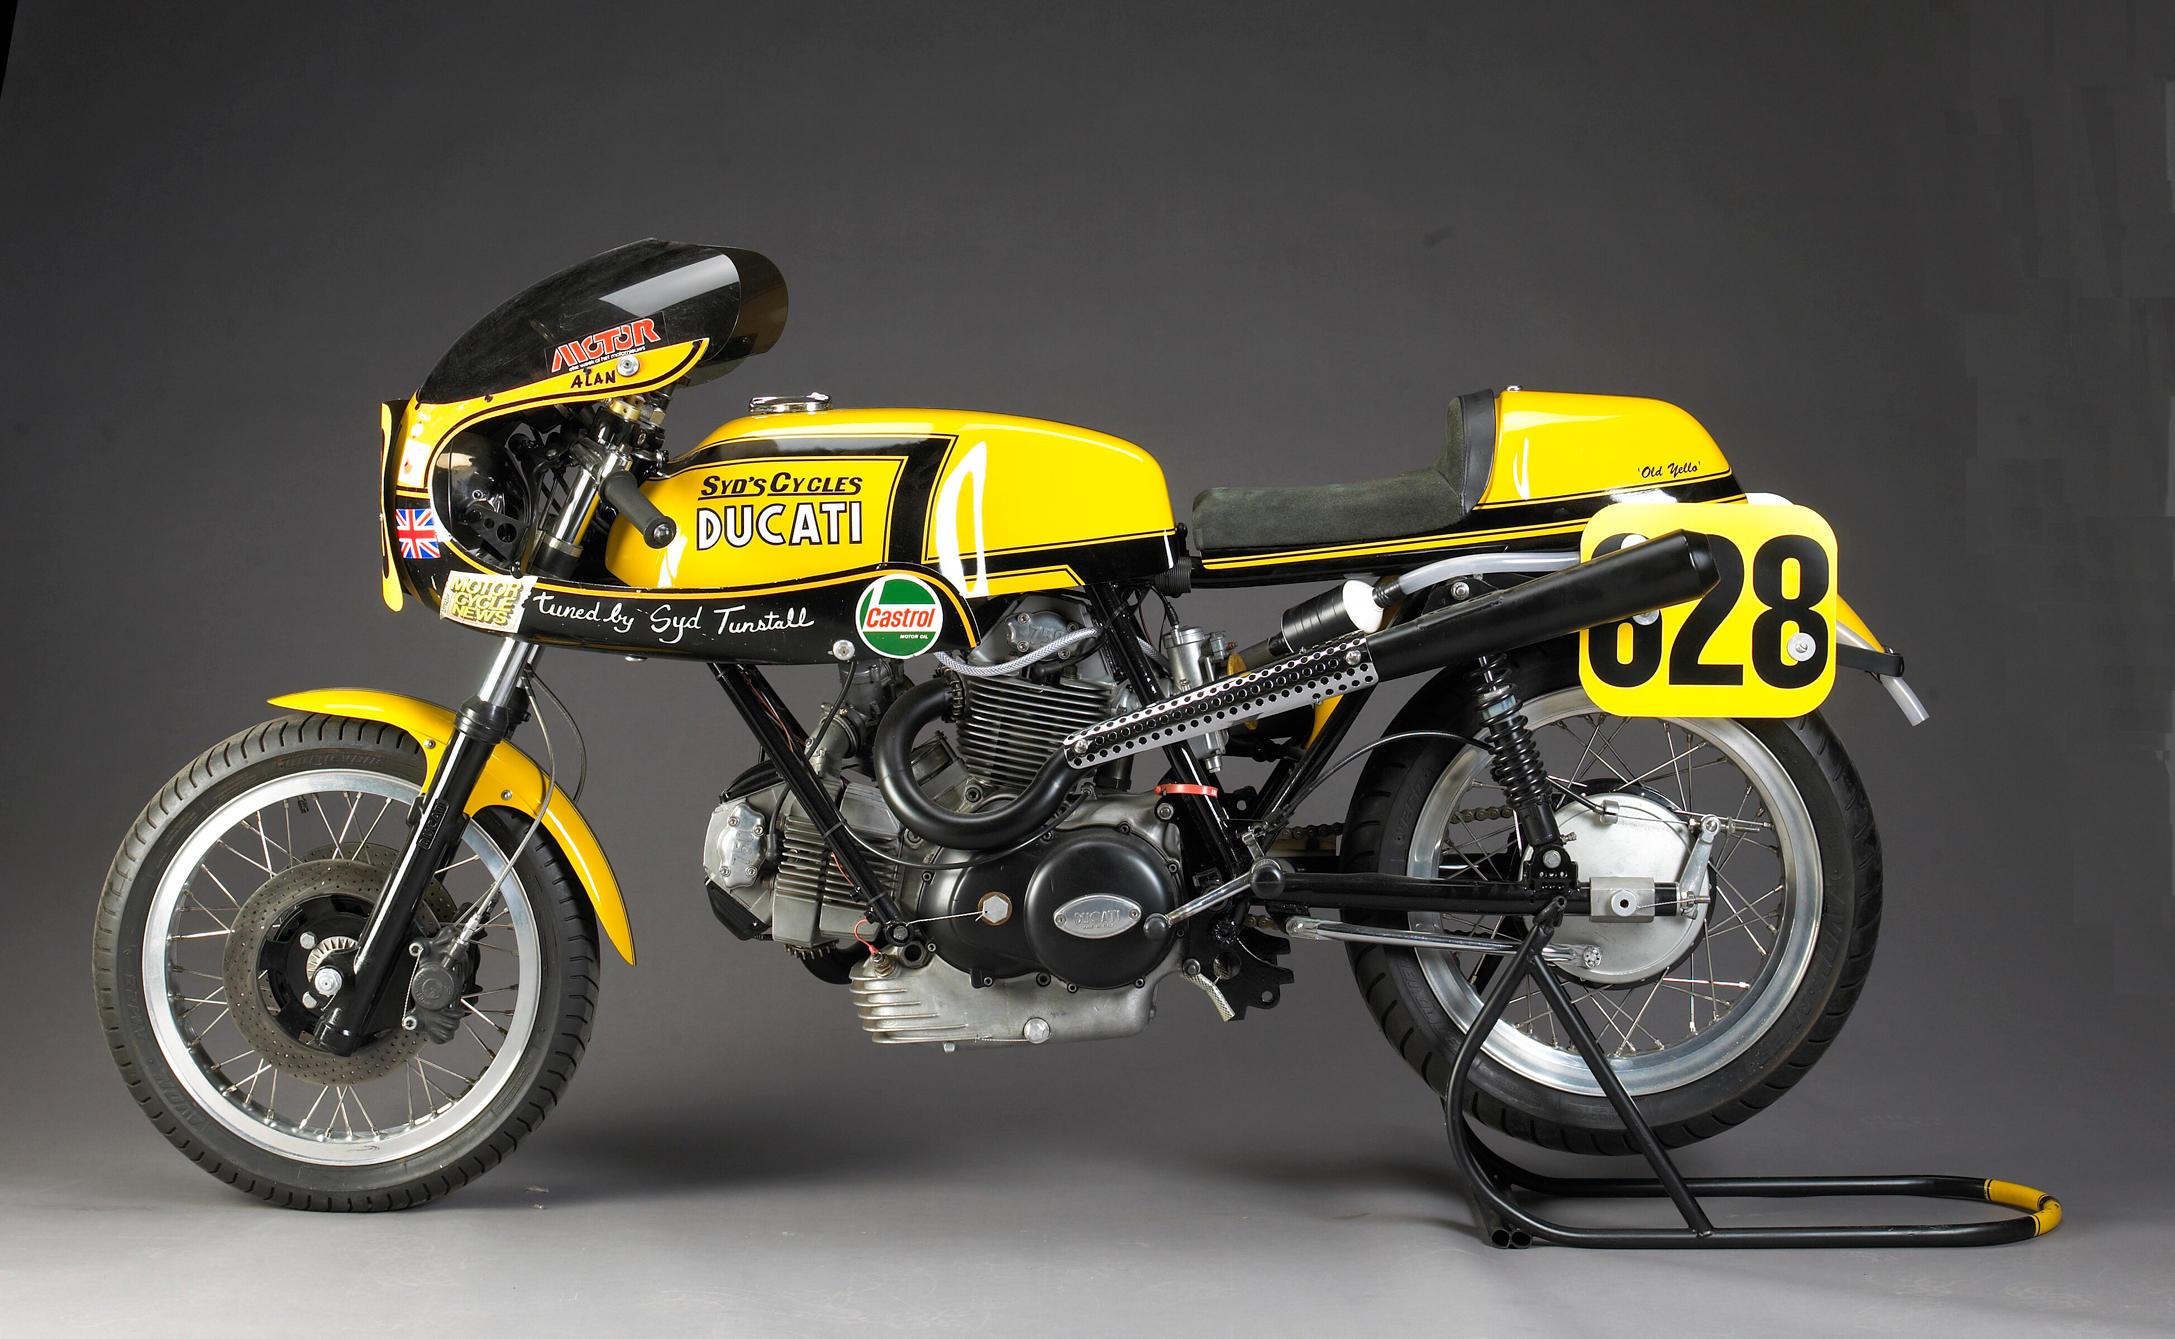 Ex-Syd Turnstall 1973 Ducati 750 Sport 885cc Racing Motorcycle 'Old Yello...